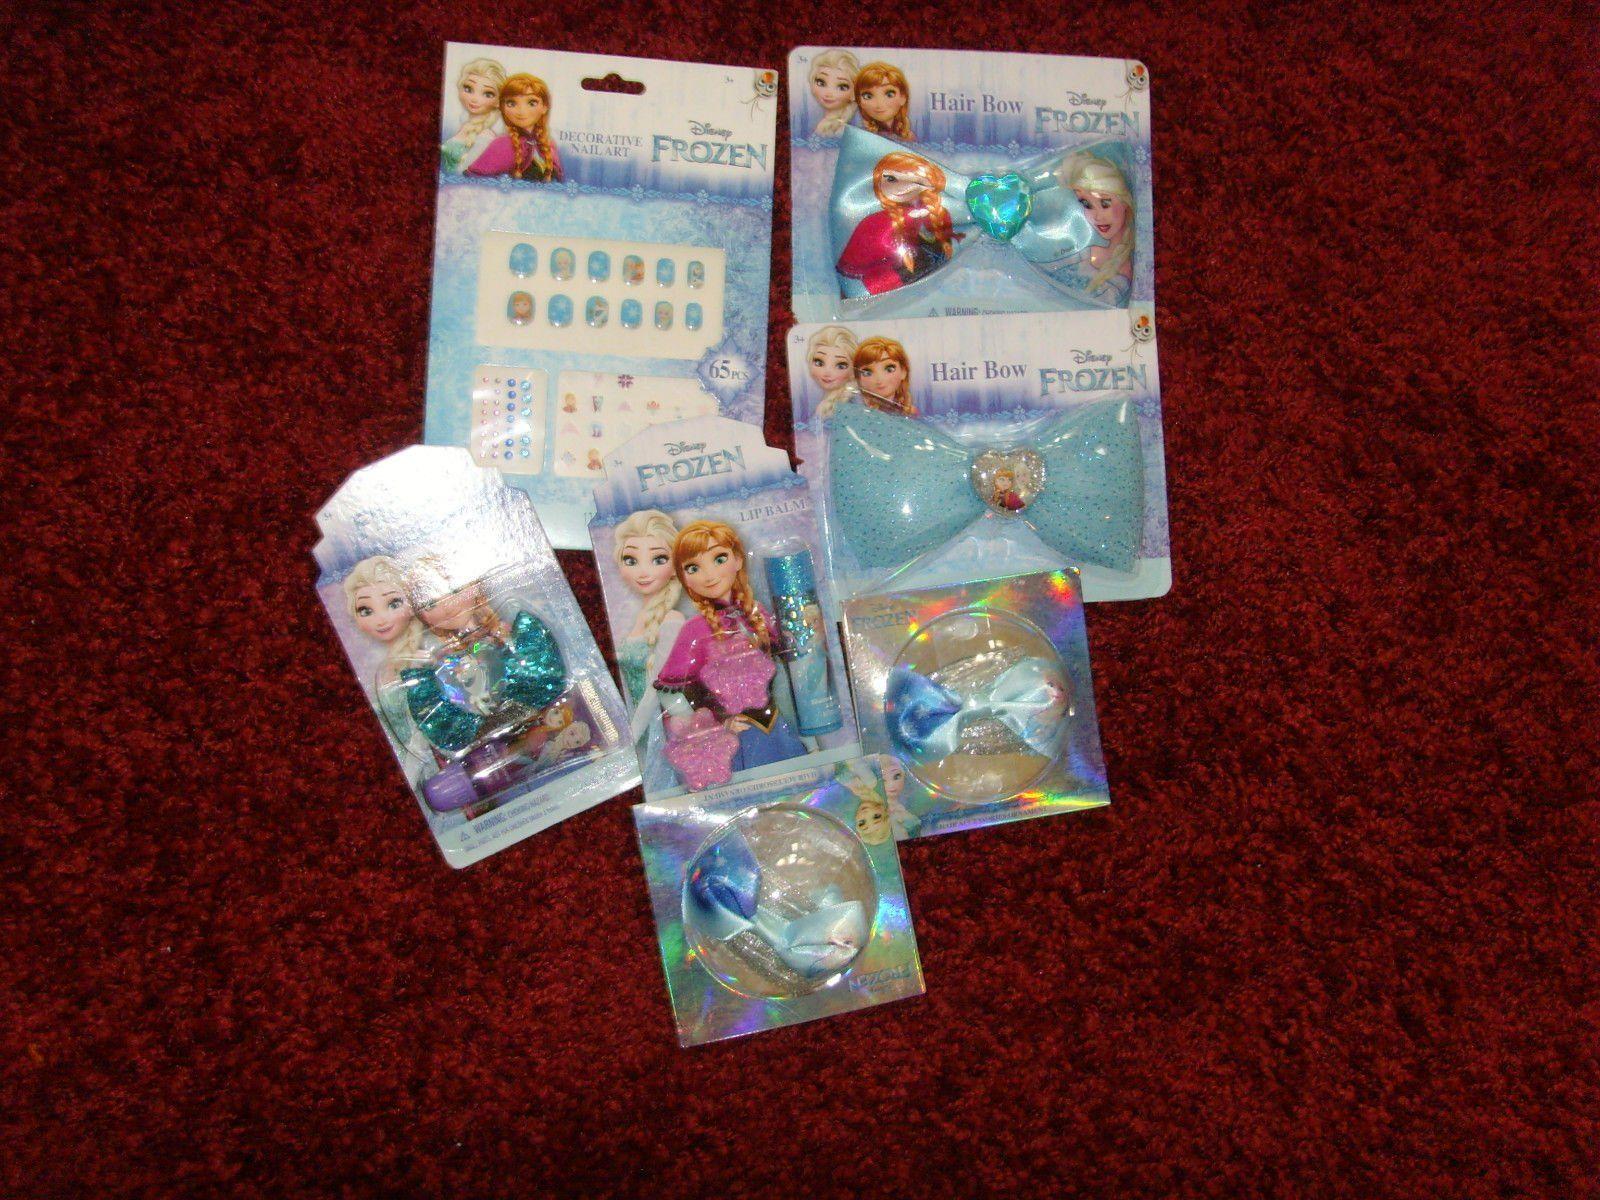 #Trending04 - NEW Beauty Lot Disney Frozen Anna Elsa gift items bows lipbalm gloss clips nails https://t.co/PlewQGMQ5C